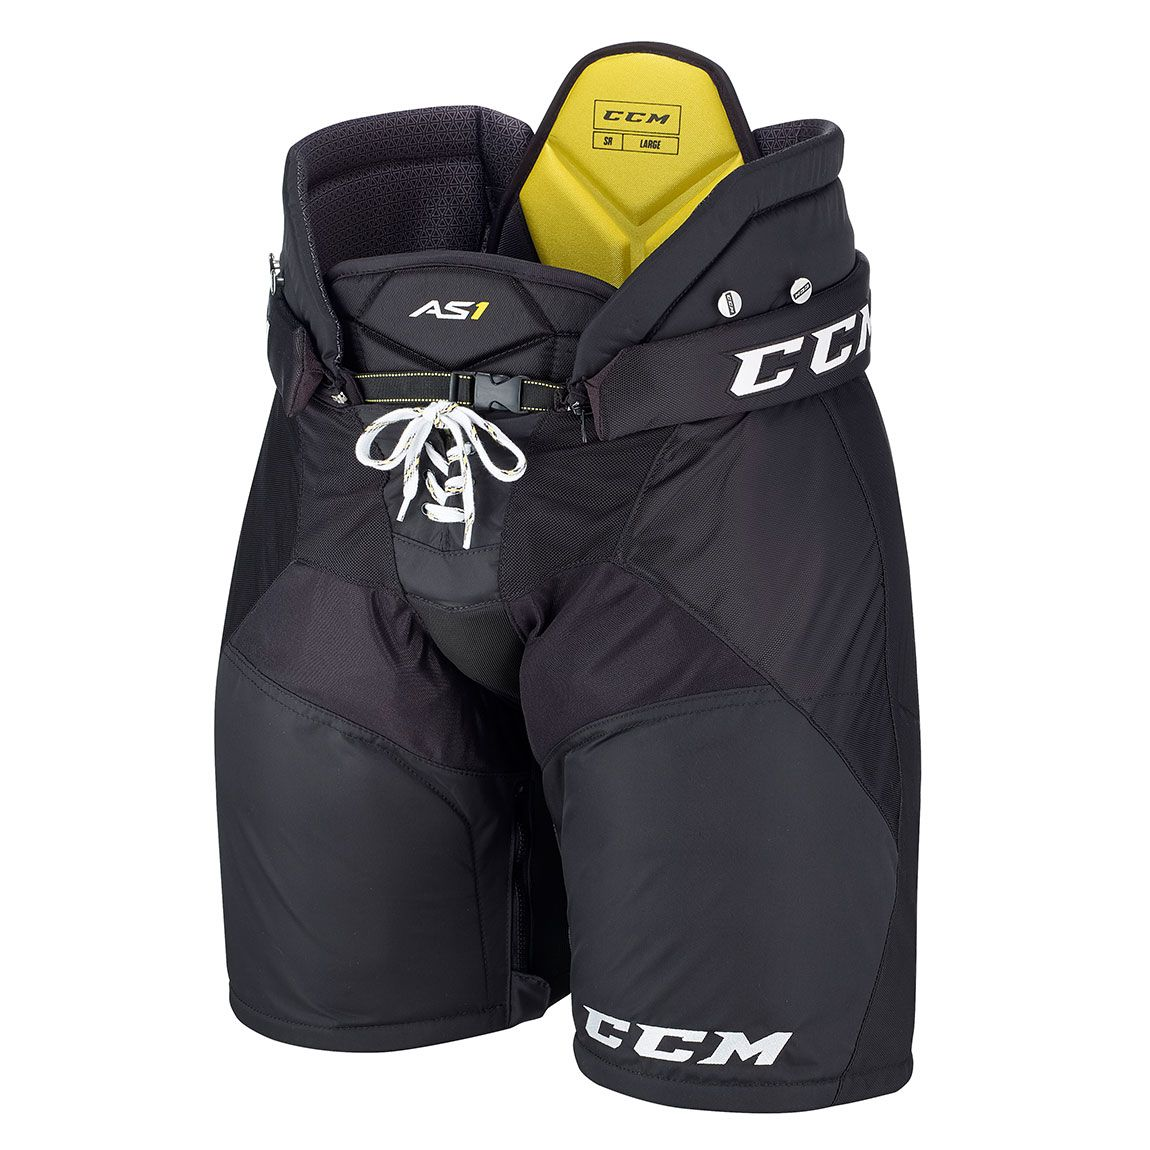 CCM SuperTacks AS1 Hockey Pants